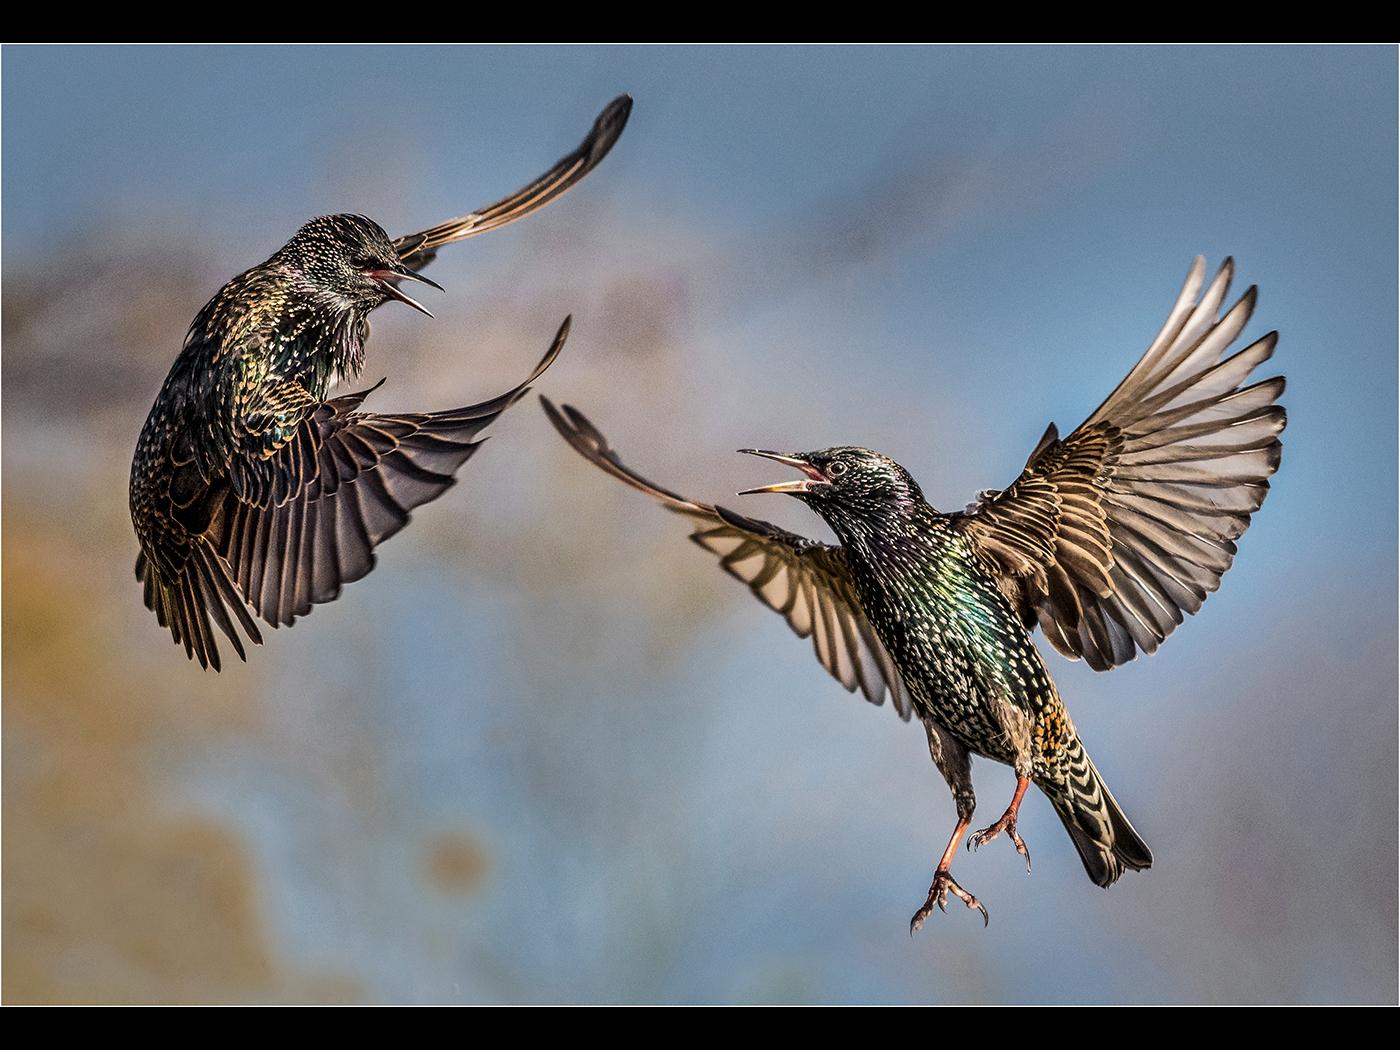 01_Bill Smith_Fighting Starlings